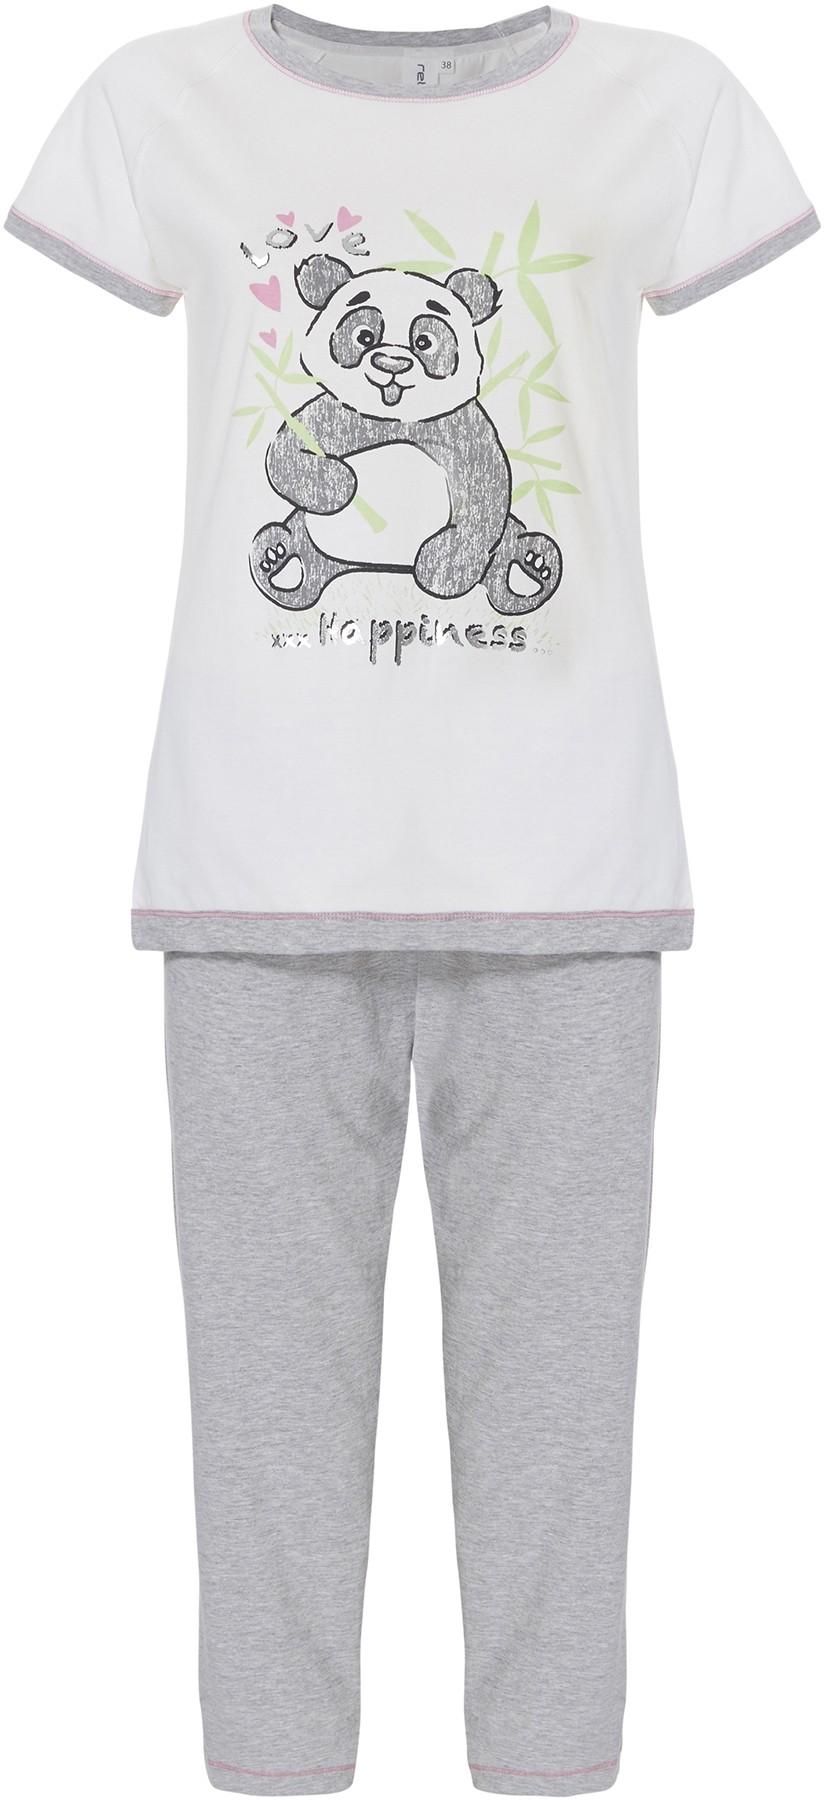 Dames Pyjama Rebelle 2181-230-2-40